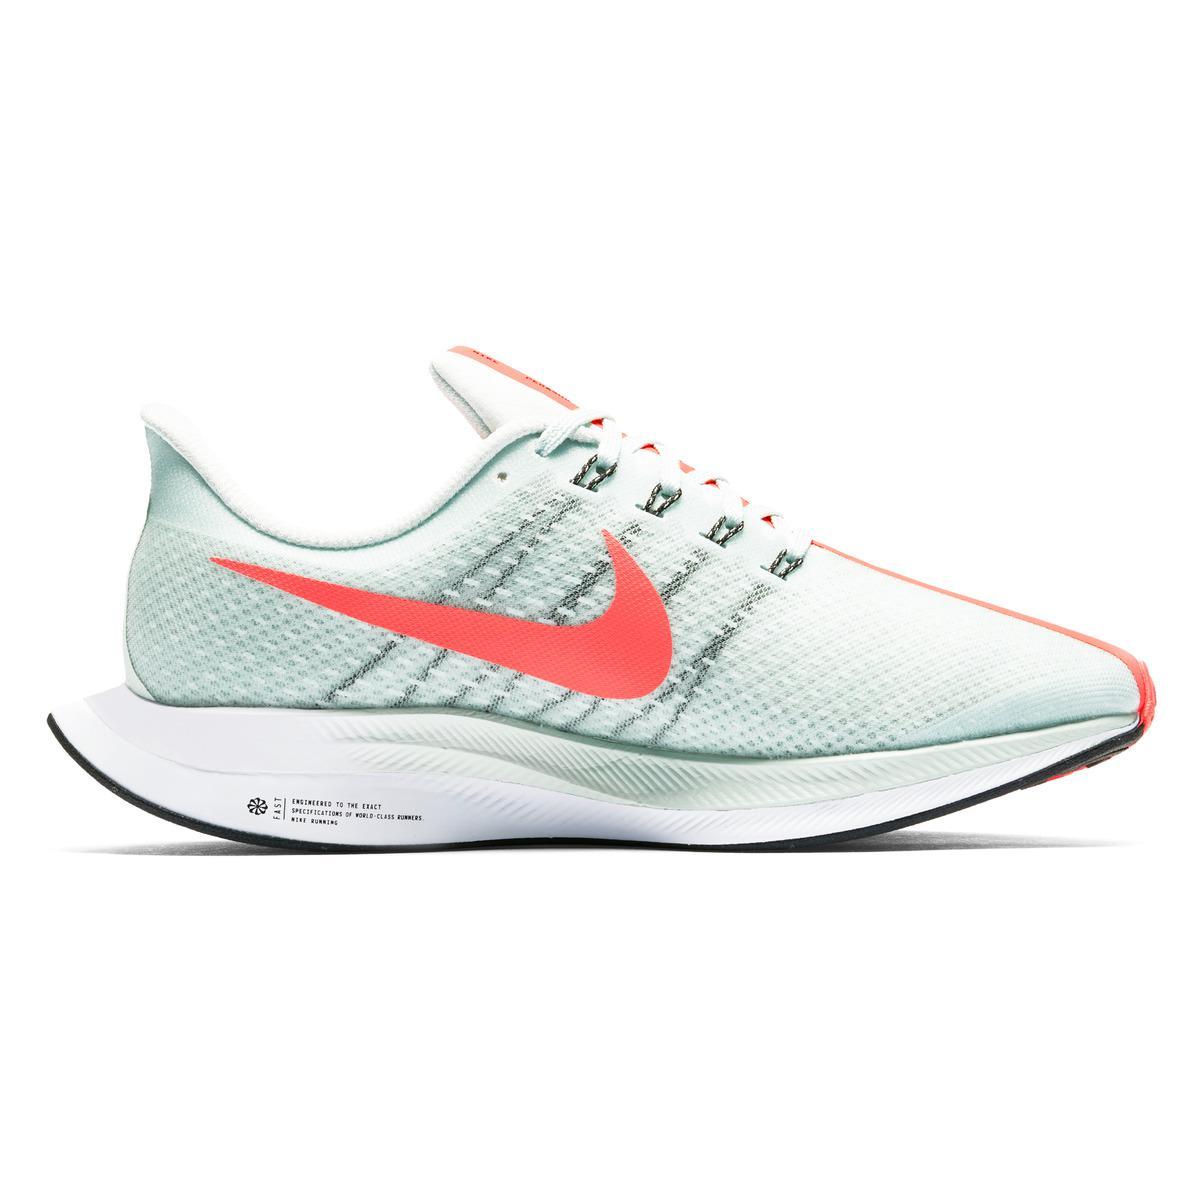 82e19c29e5c4 Nike. Women s Gray Zoom Pegasus Turbo Running Shoes. £161 From El Corte  Ingles